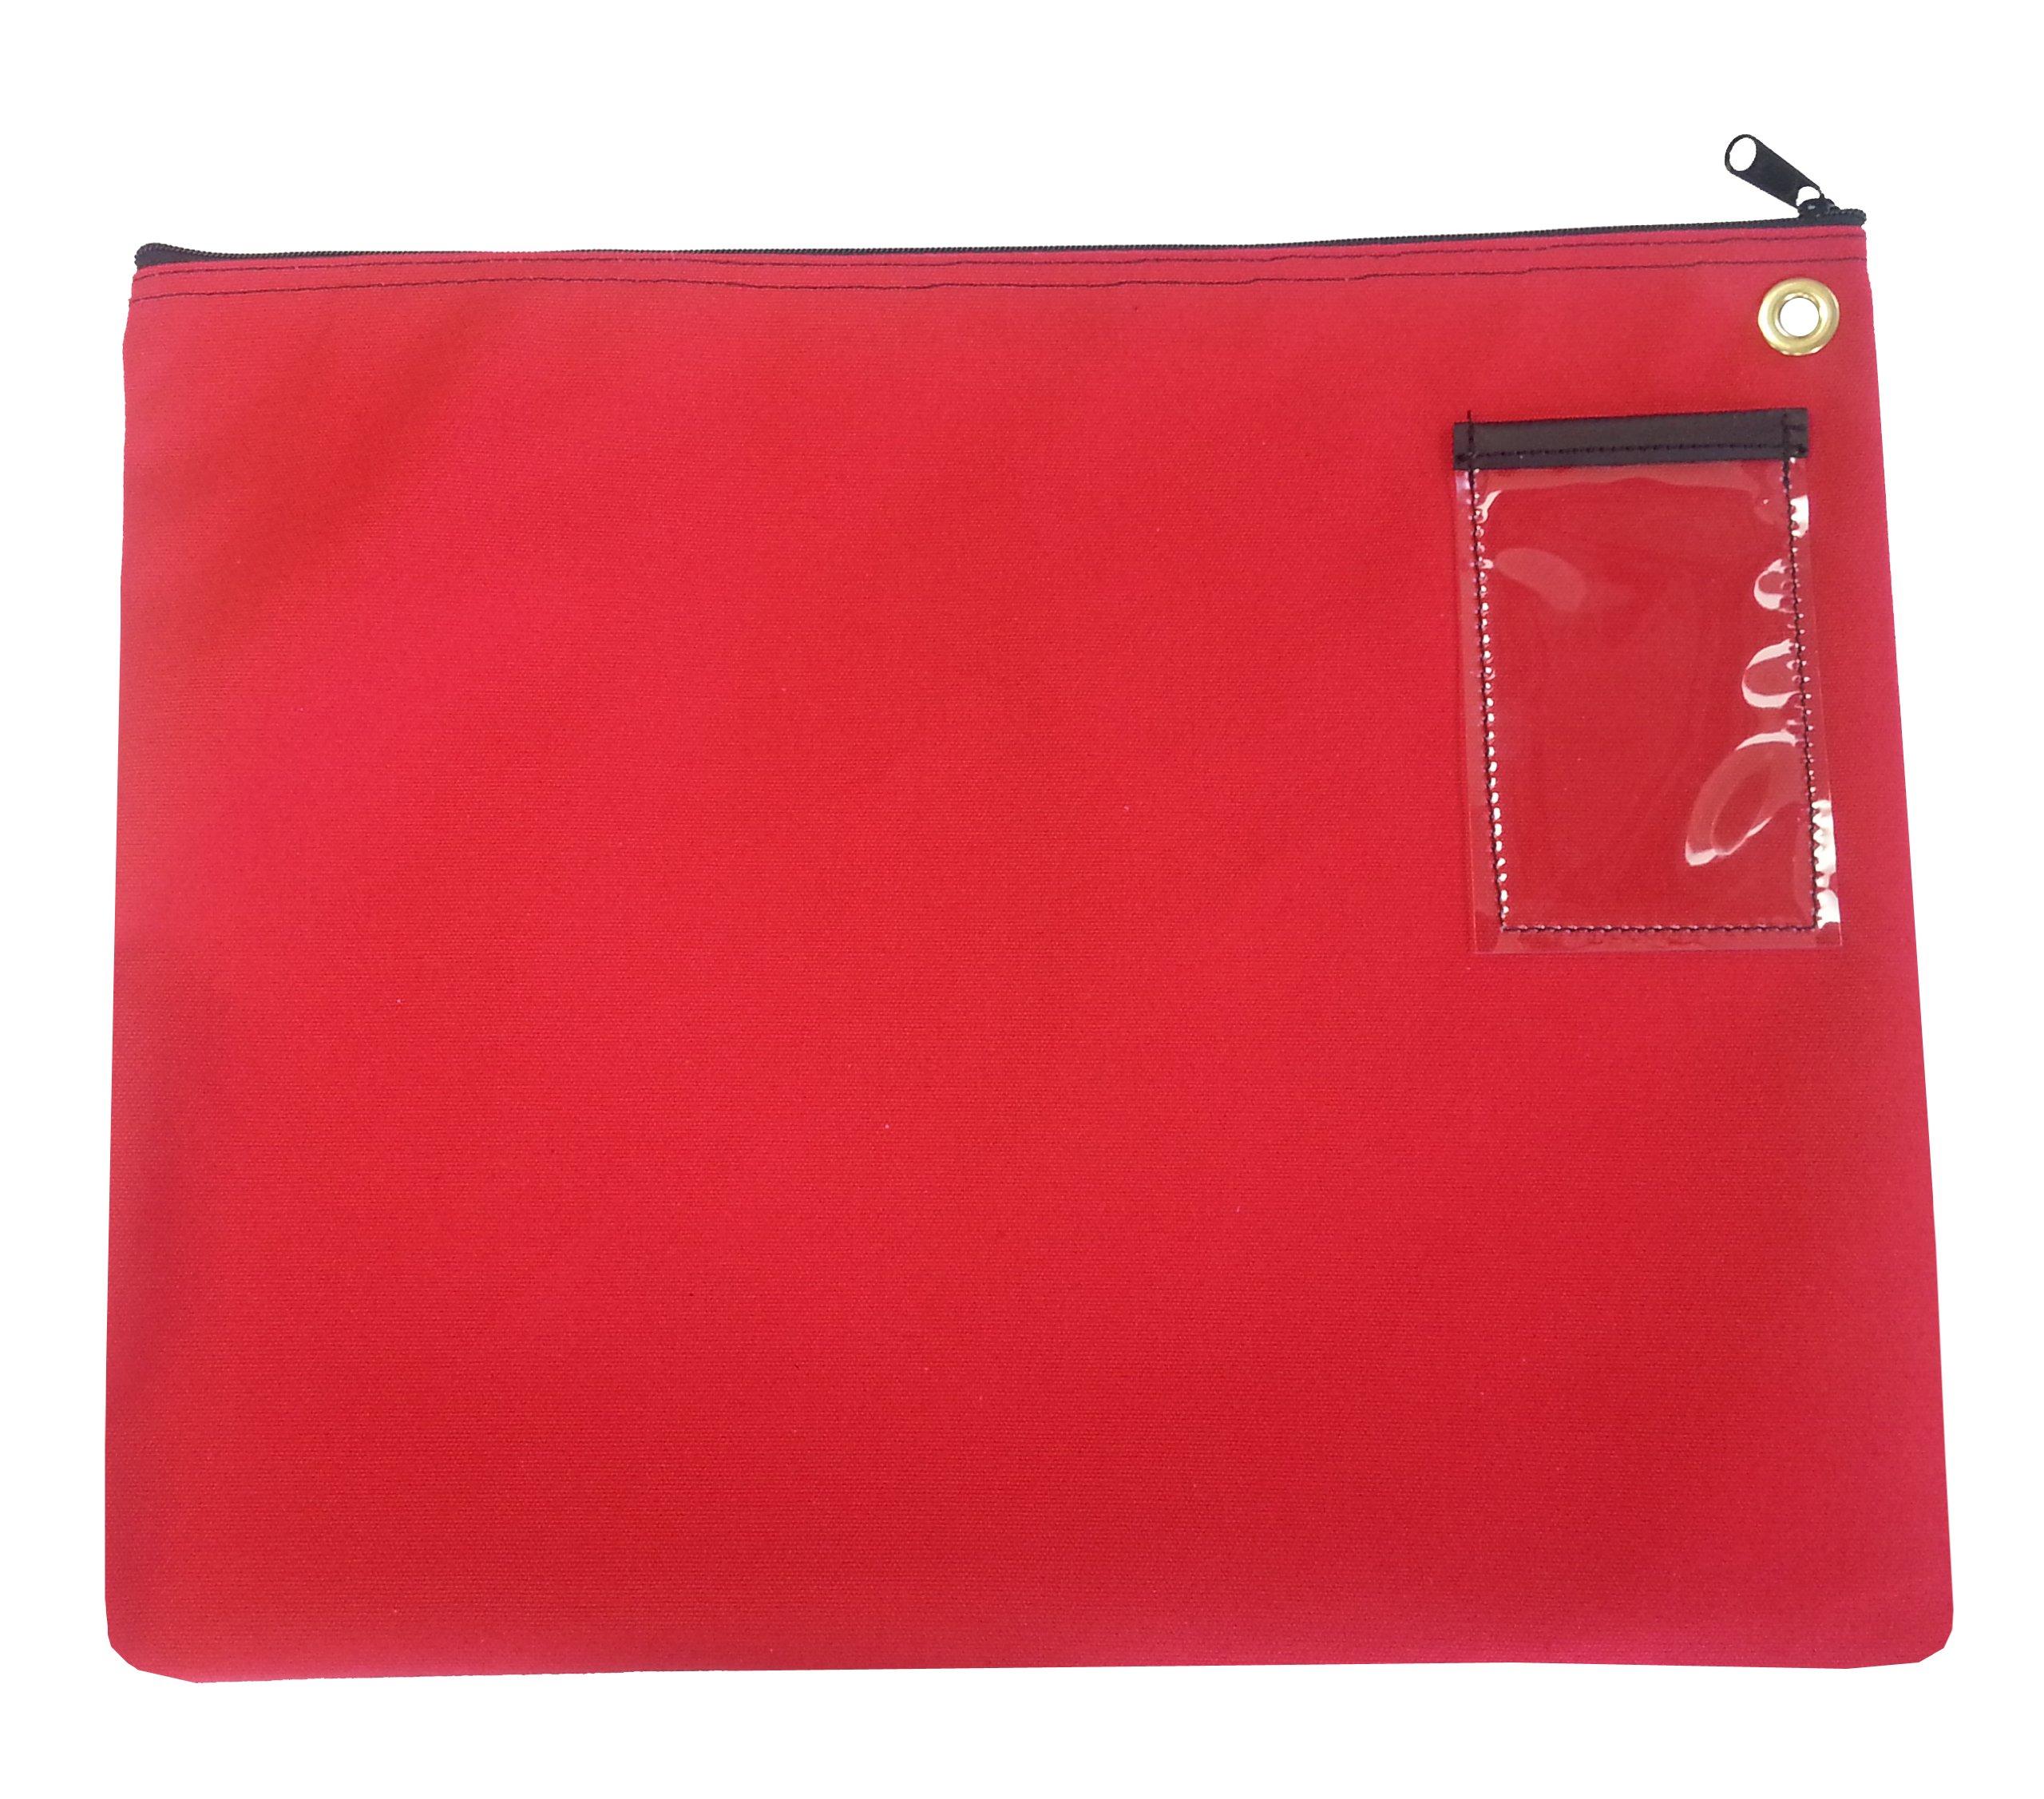 Interoffice Mailer Canvas Transit Sack Zipper Bag 18w x 14h Red by Cardinal bag supplies